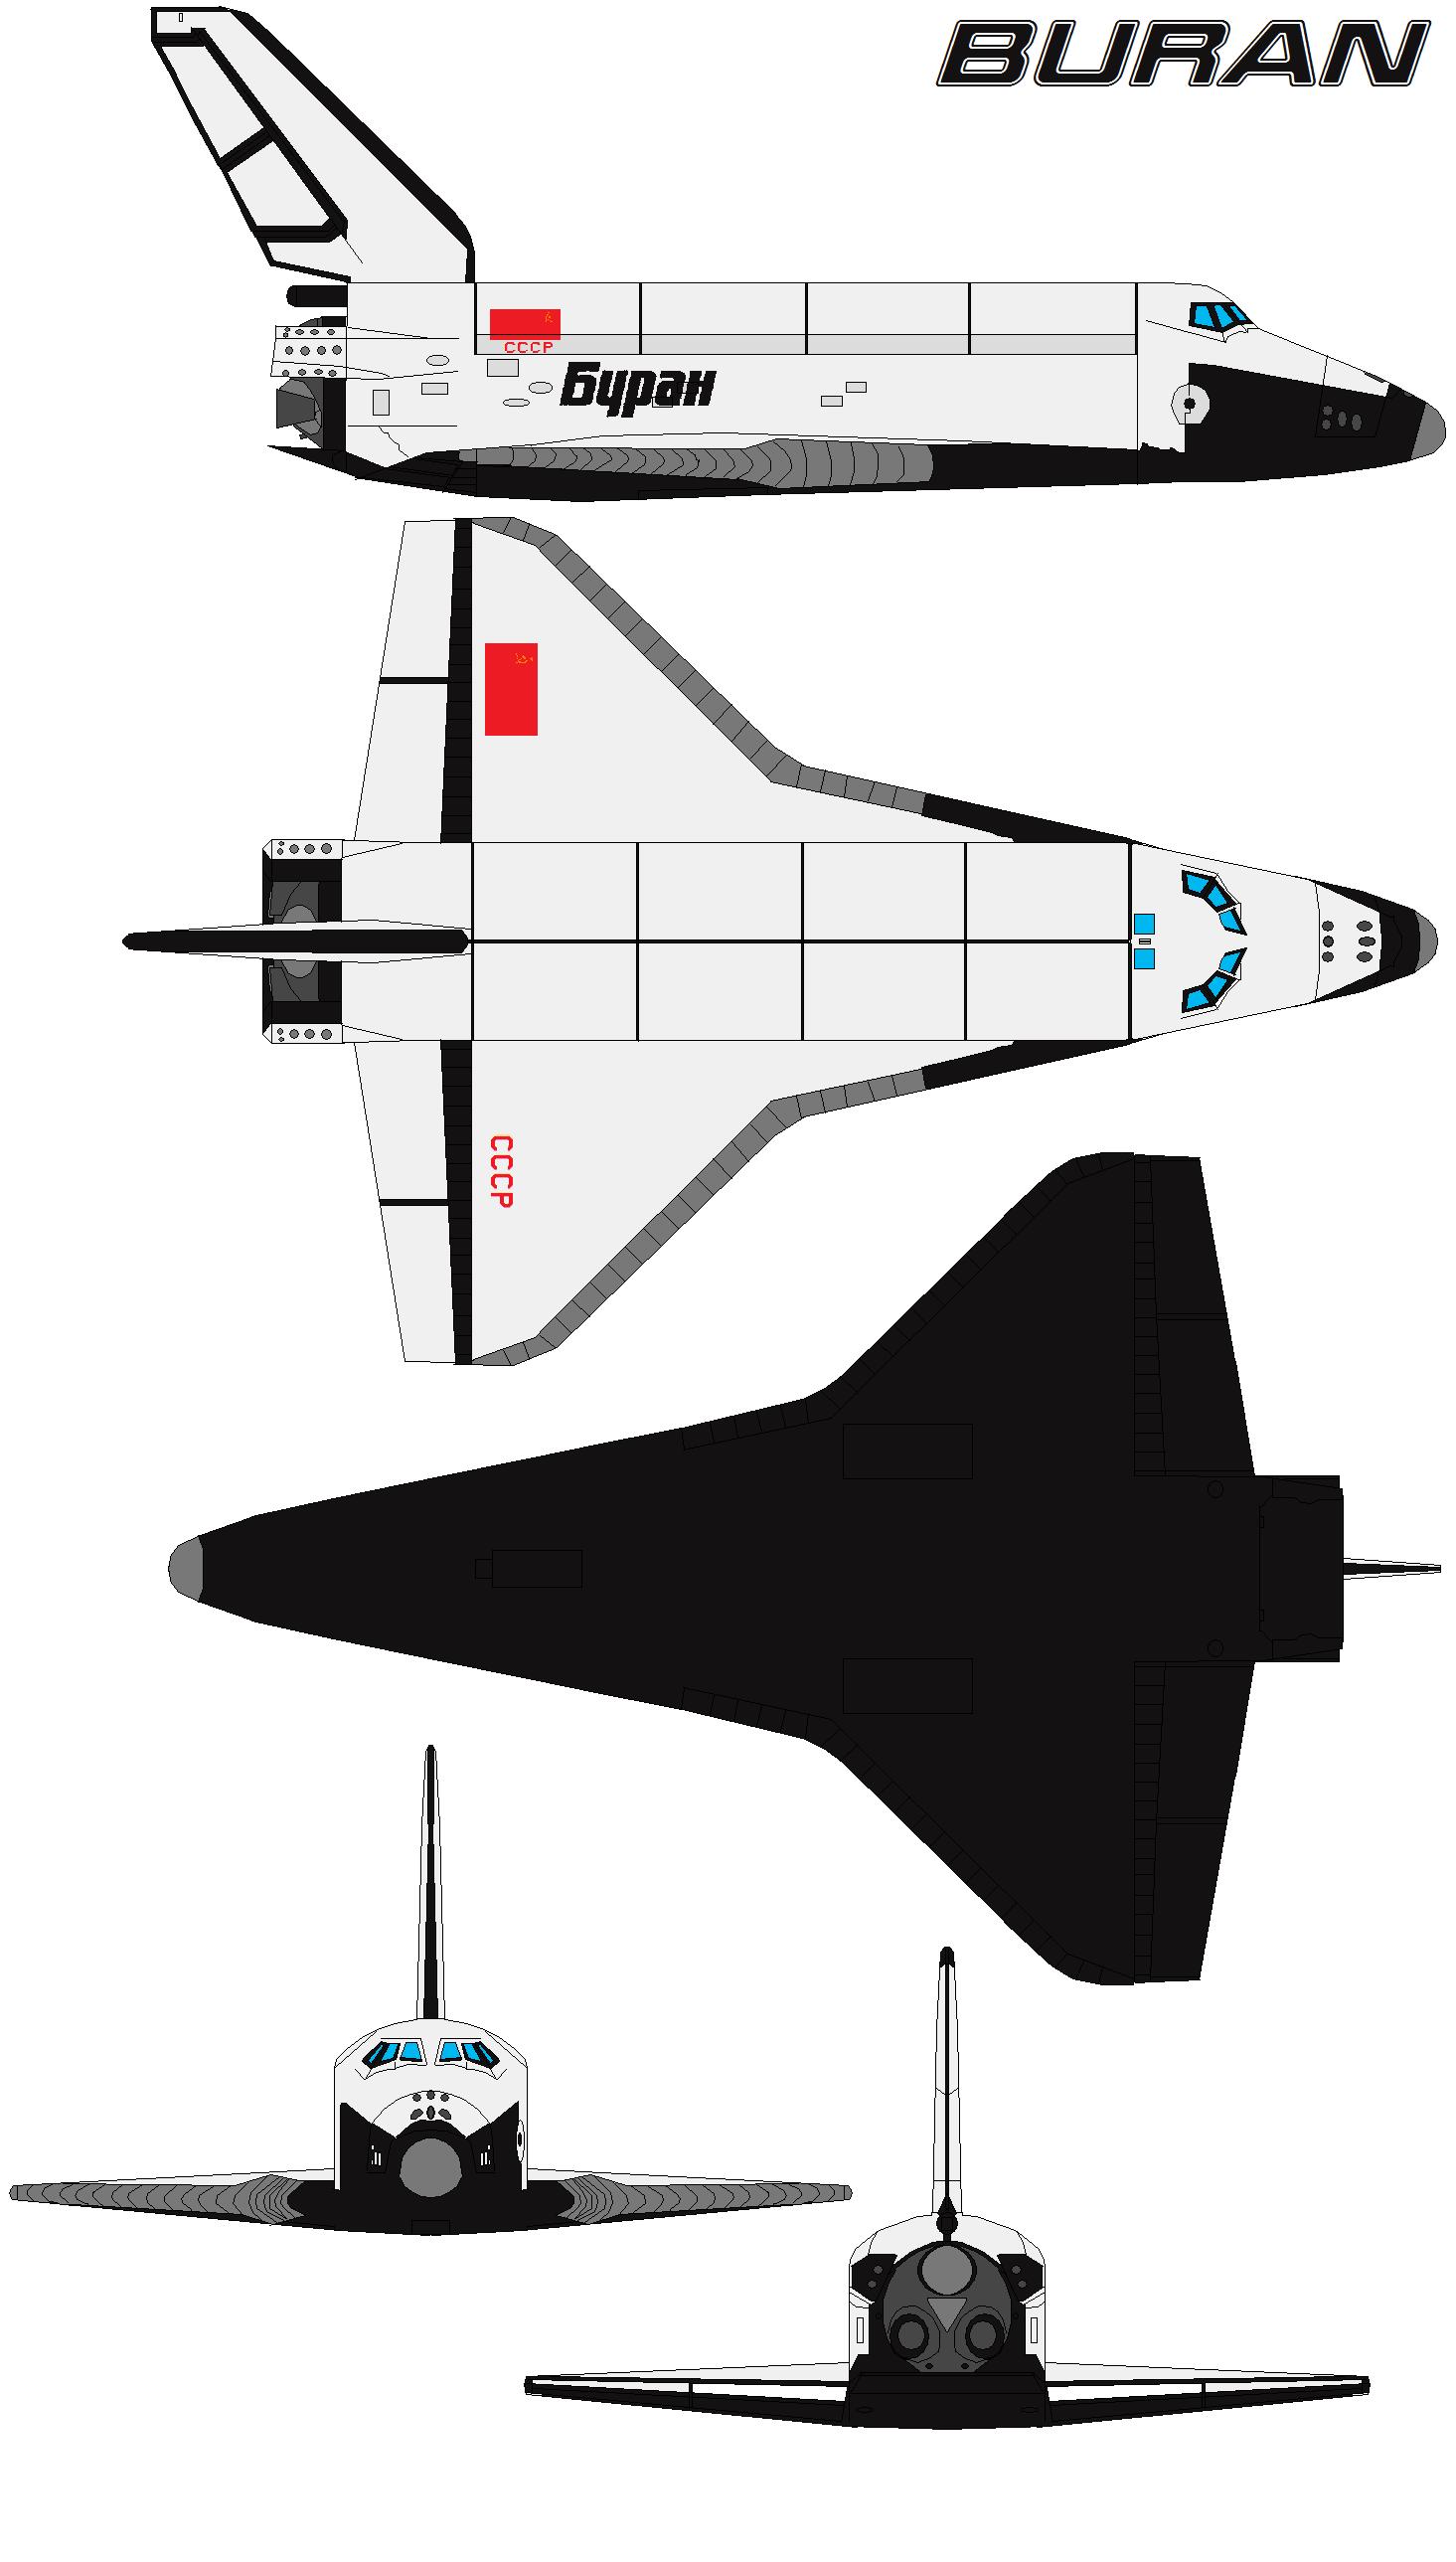 1st space shuttle flight - photo #40